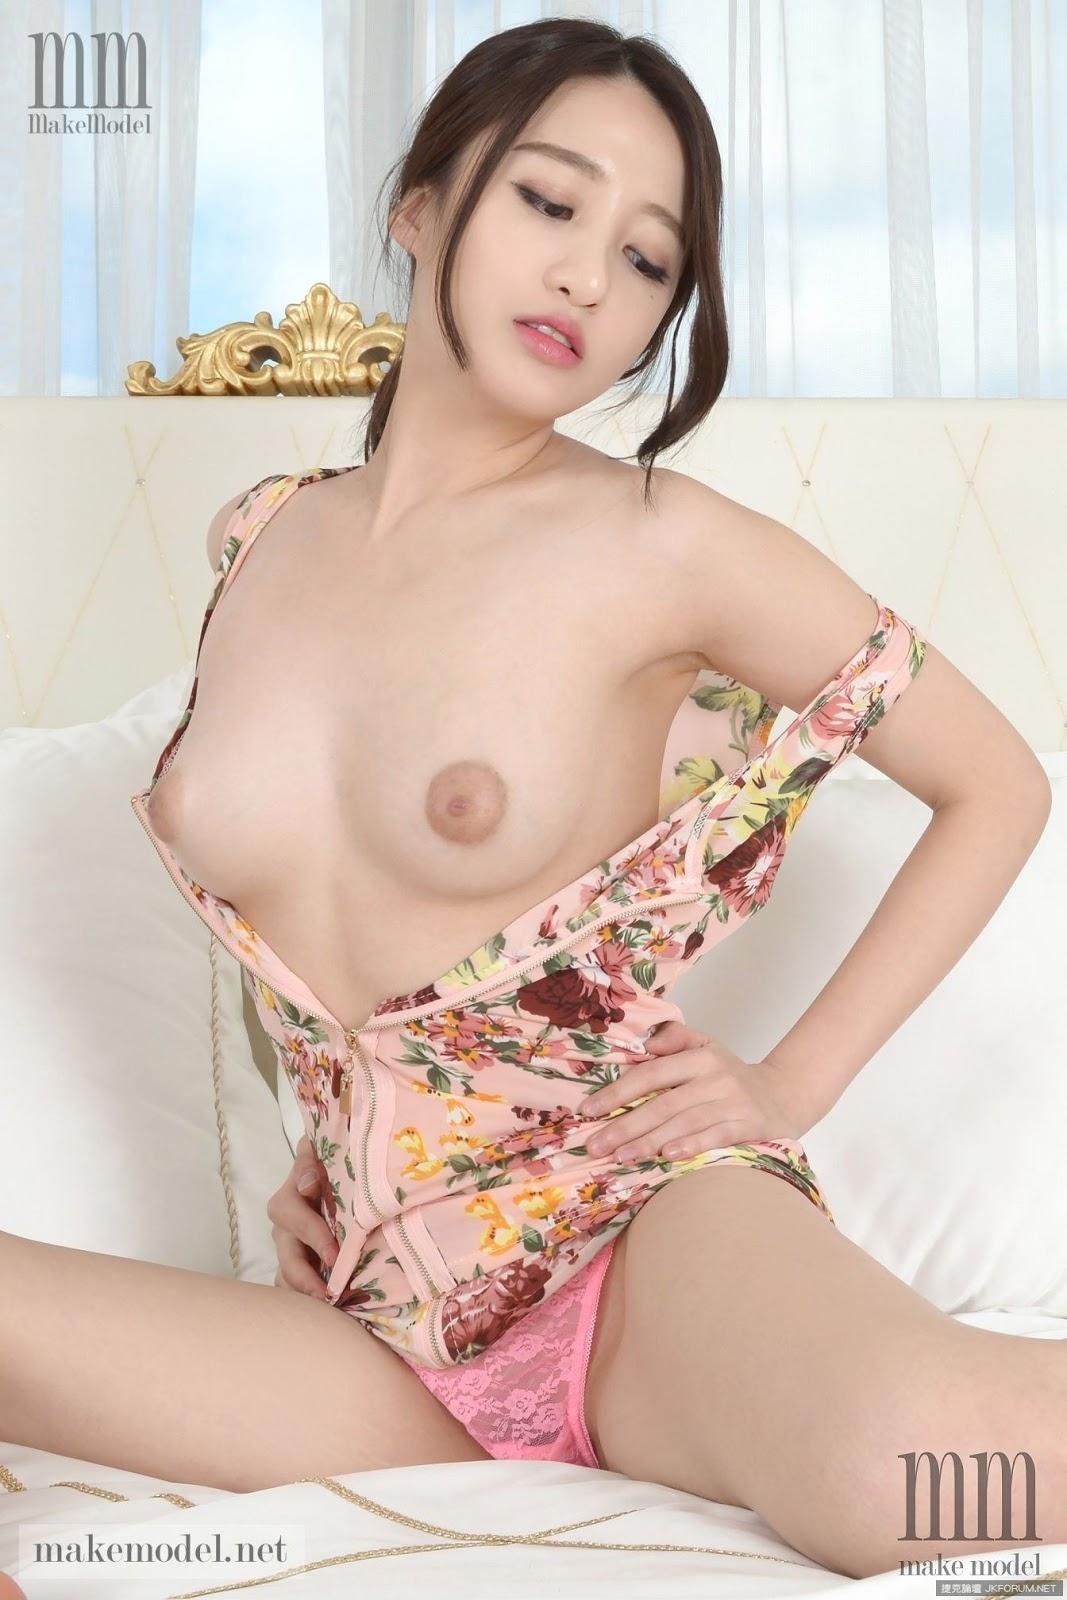 Korean nude model